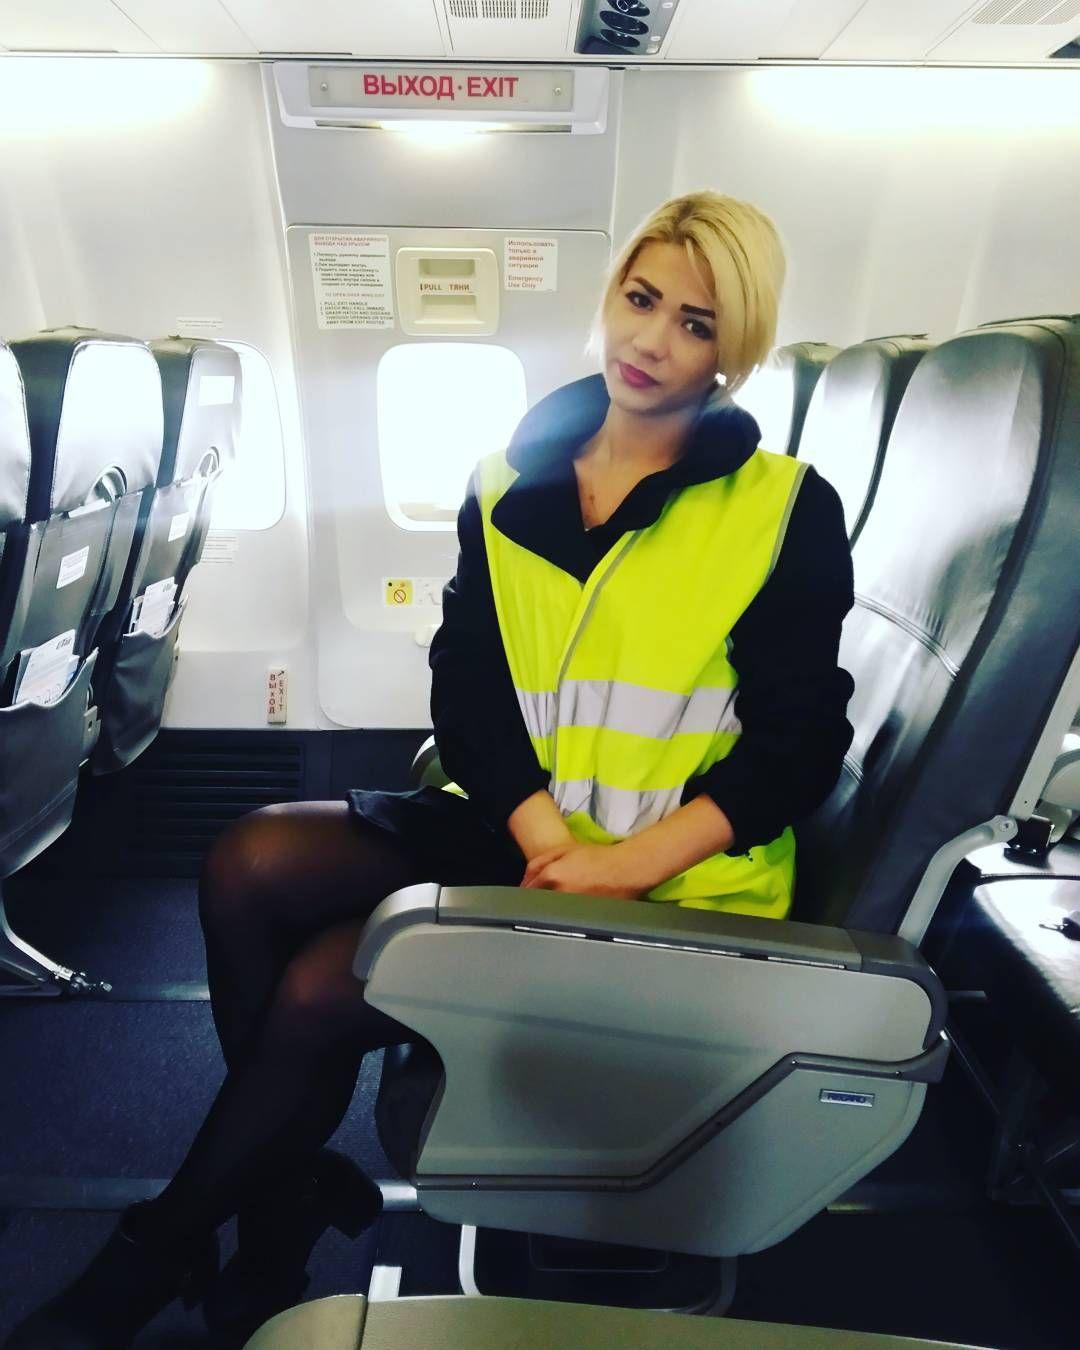 Pin On Air Hostess Cabin Crew Flight Attendant